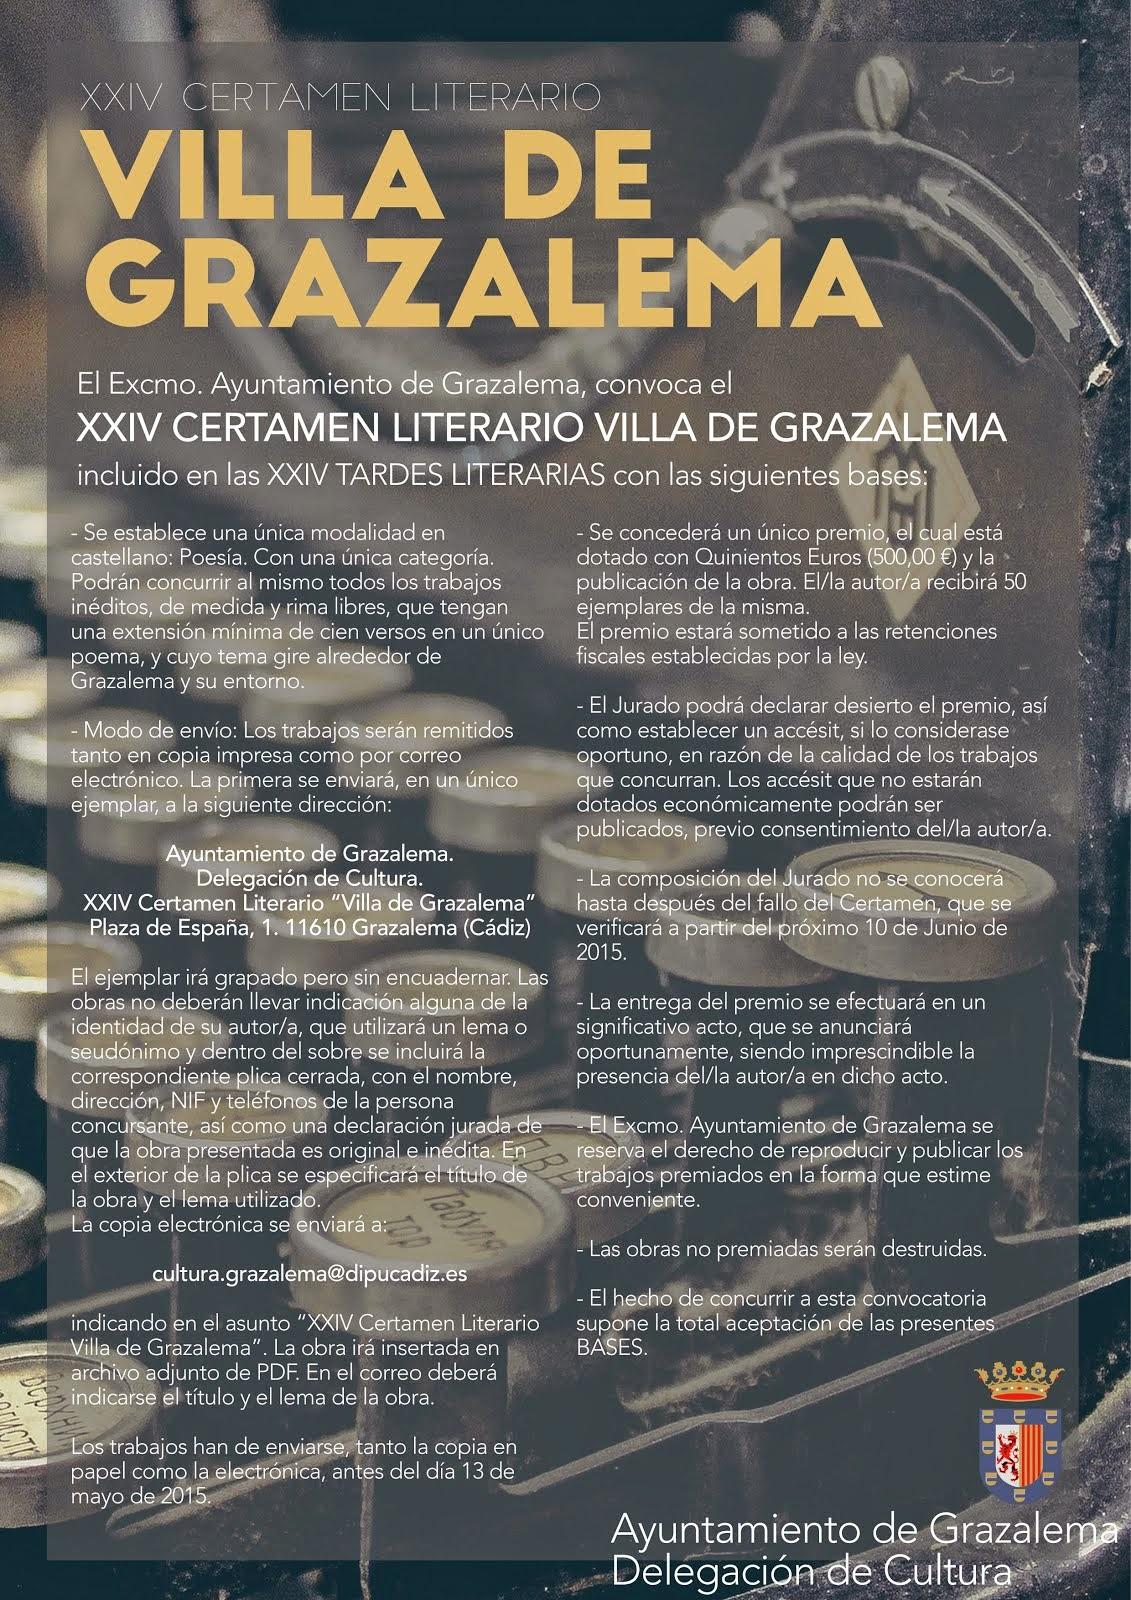 Bases del Certamen Literario Villa de Grazalema